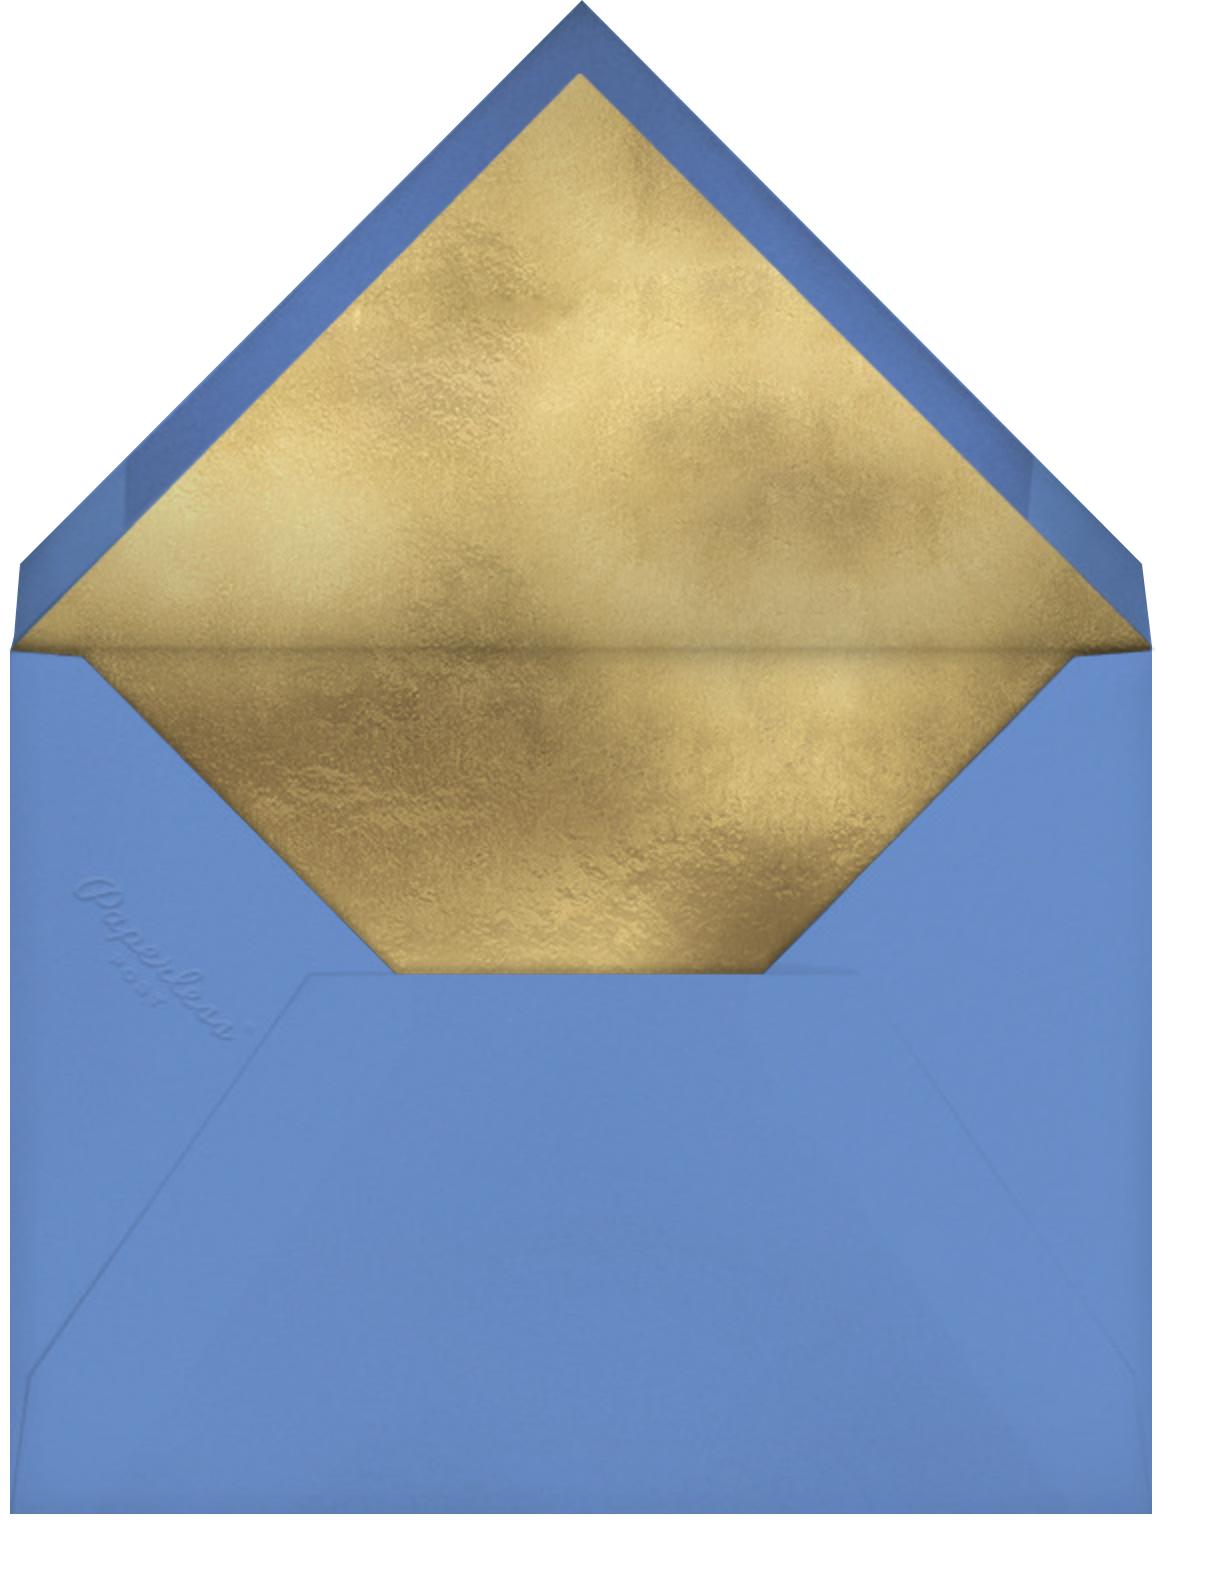 Wrapping Paper - Antwerp - kate spade new york - Hanukkah - envelope back